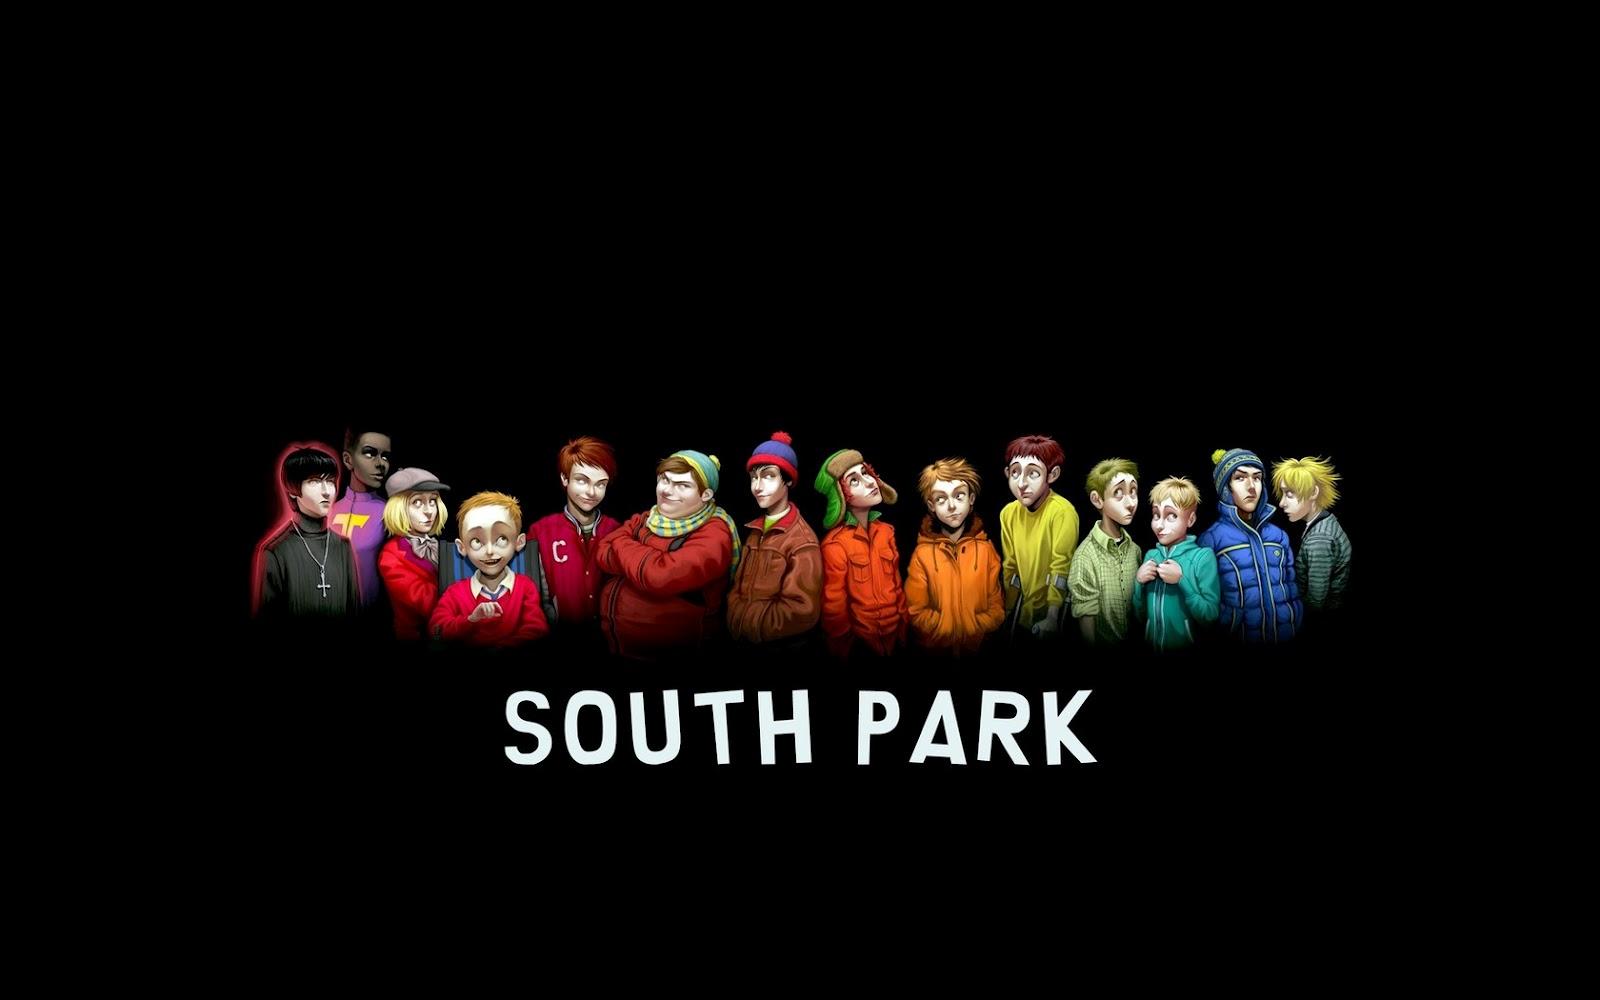 South Park Characters Elder Versions HD Cartoon Wallpaper 1600x1000